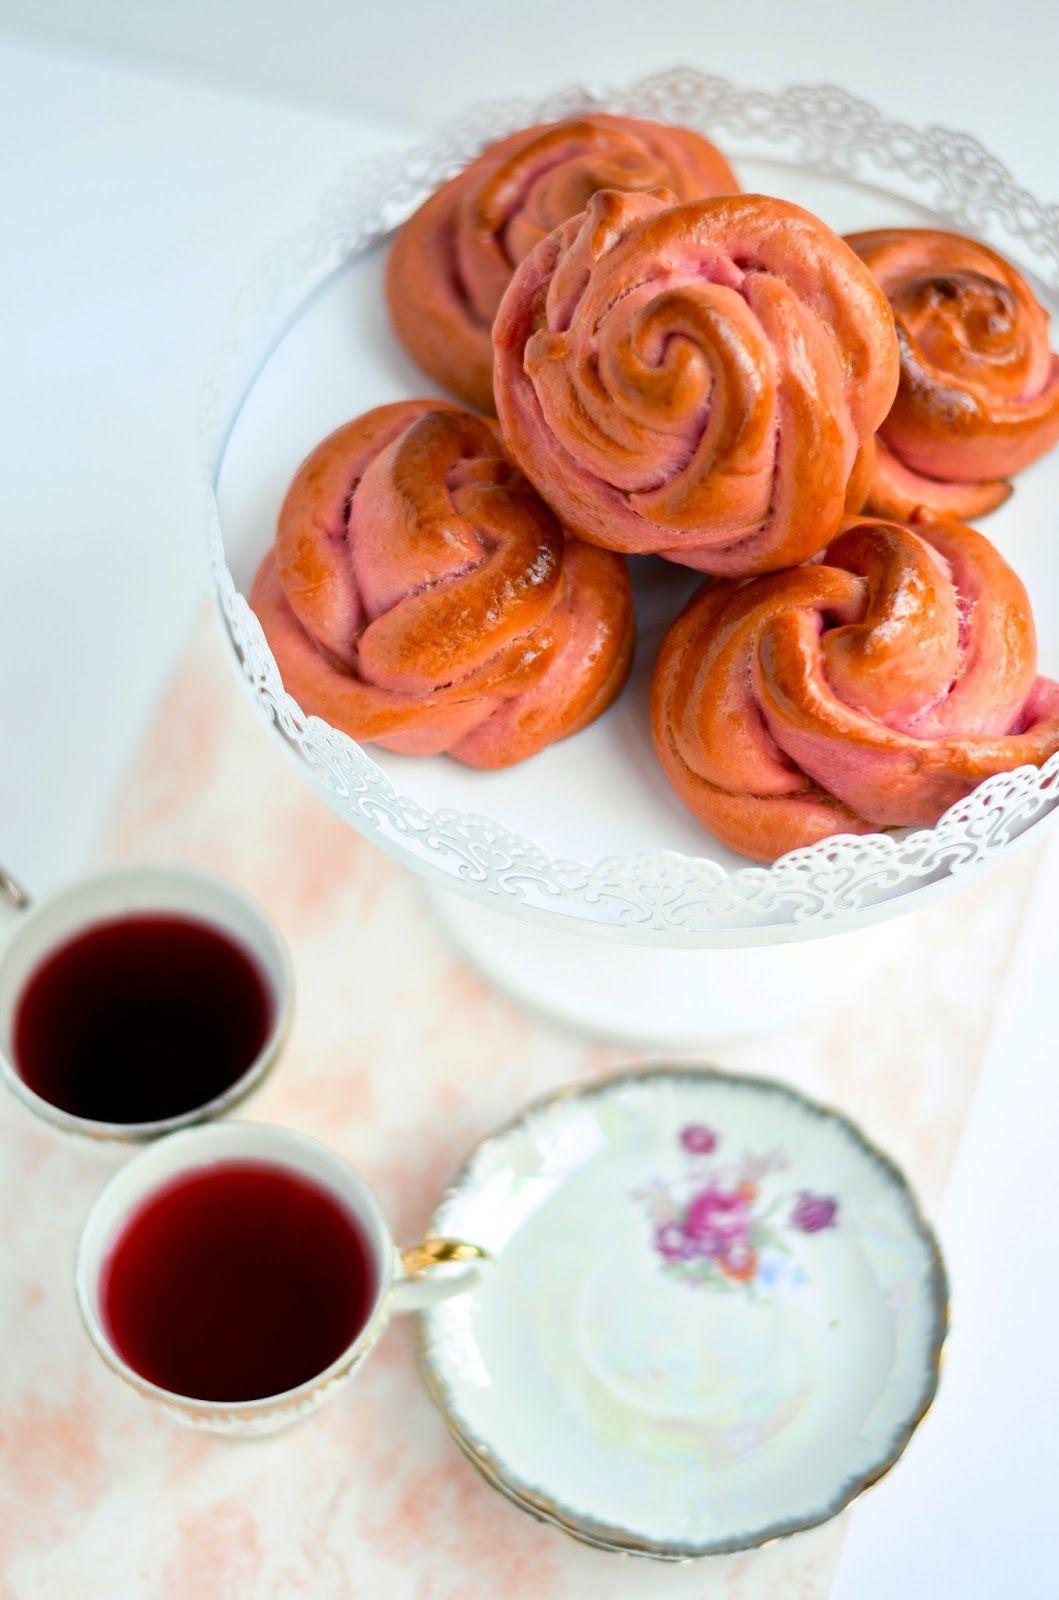 Strawberry tea roses